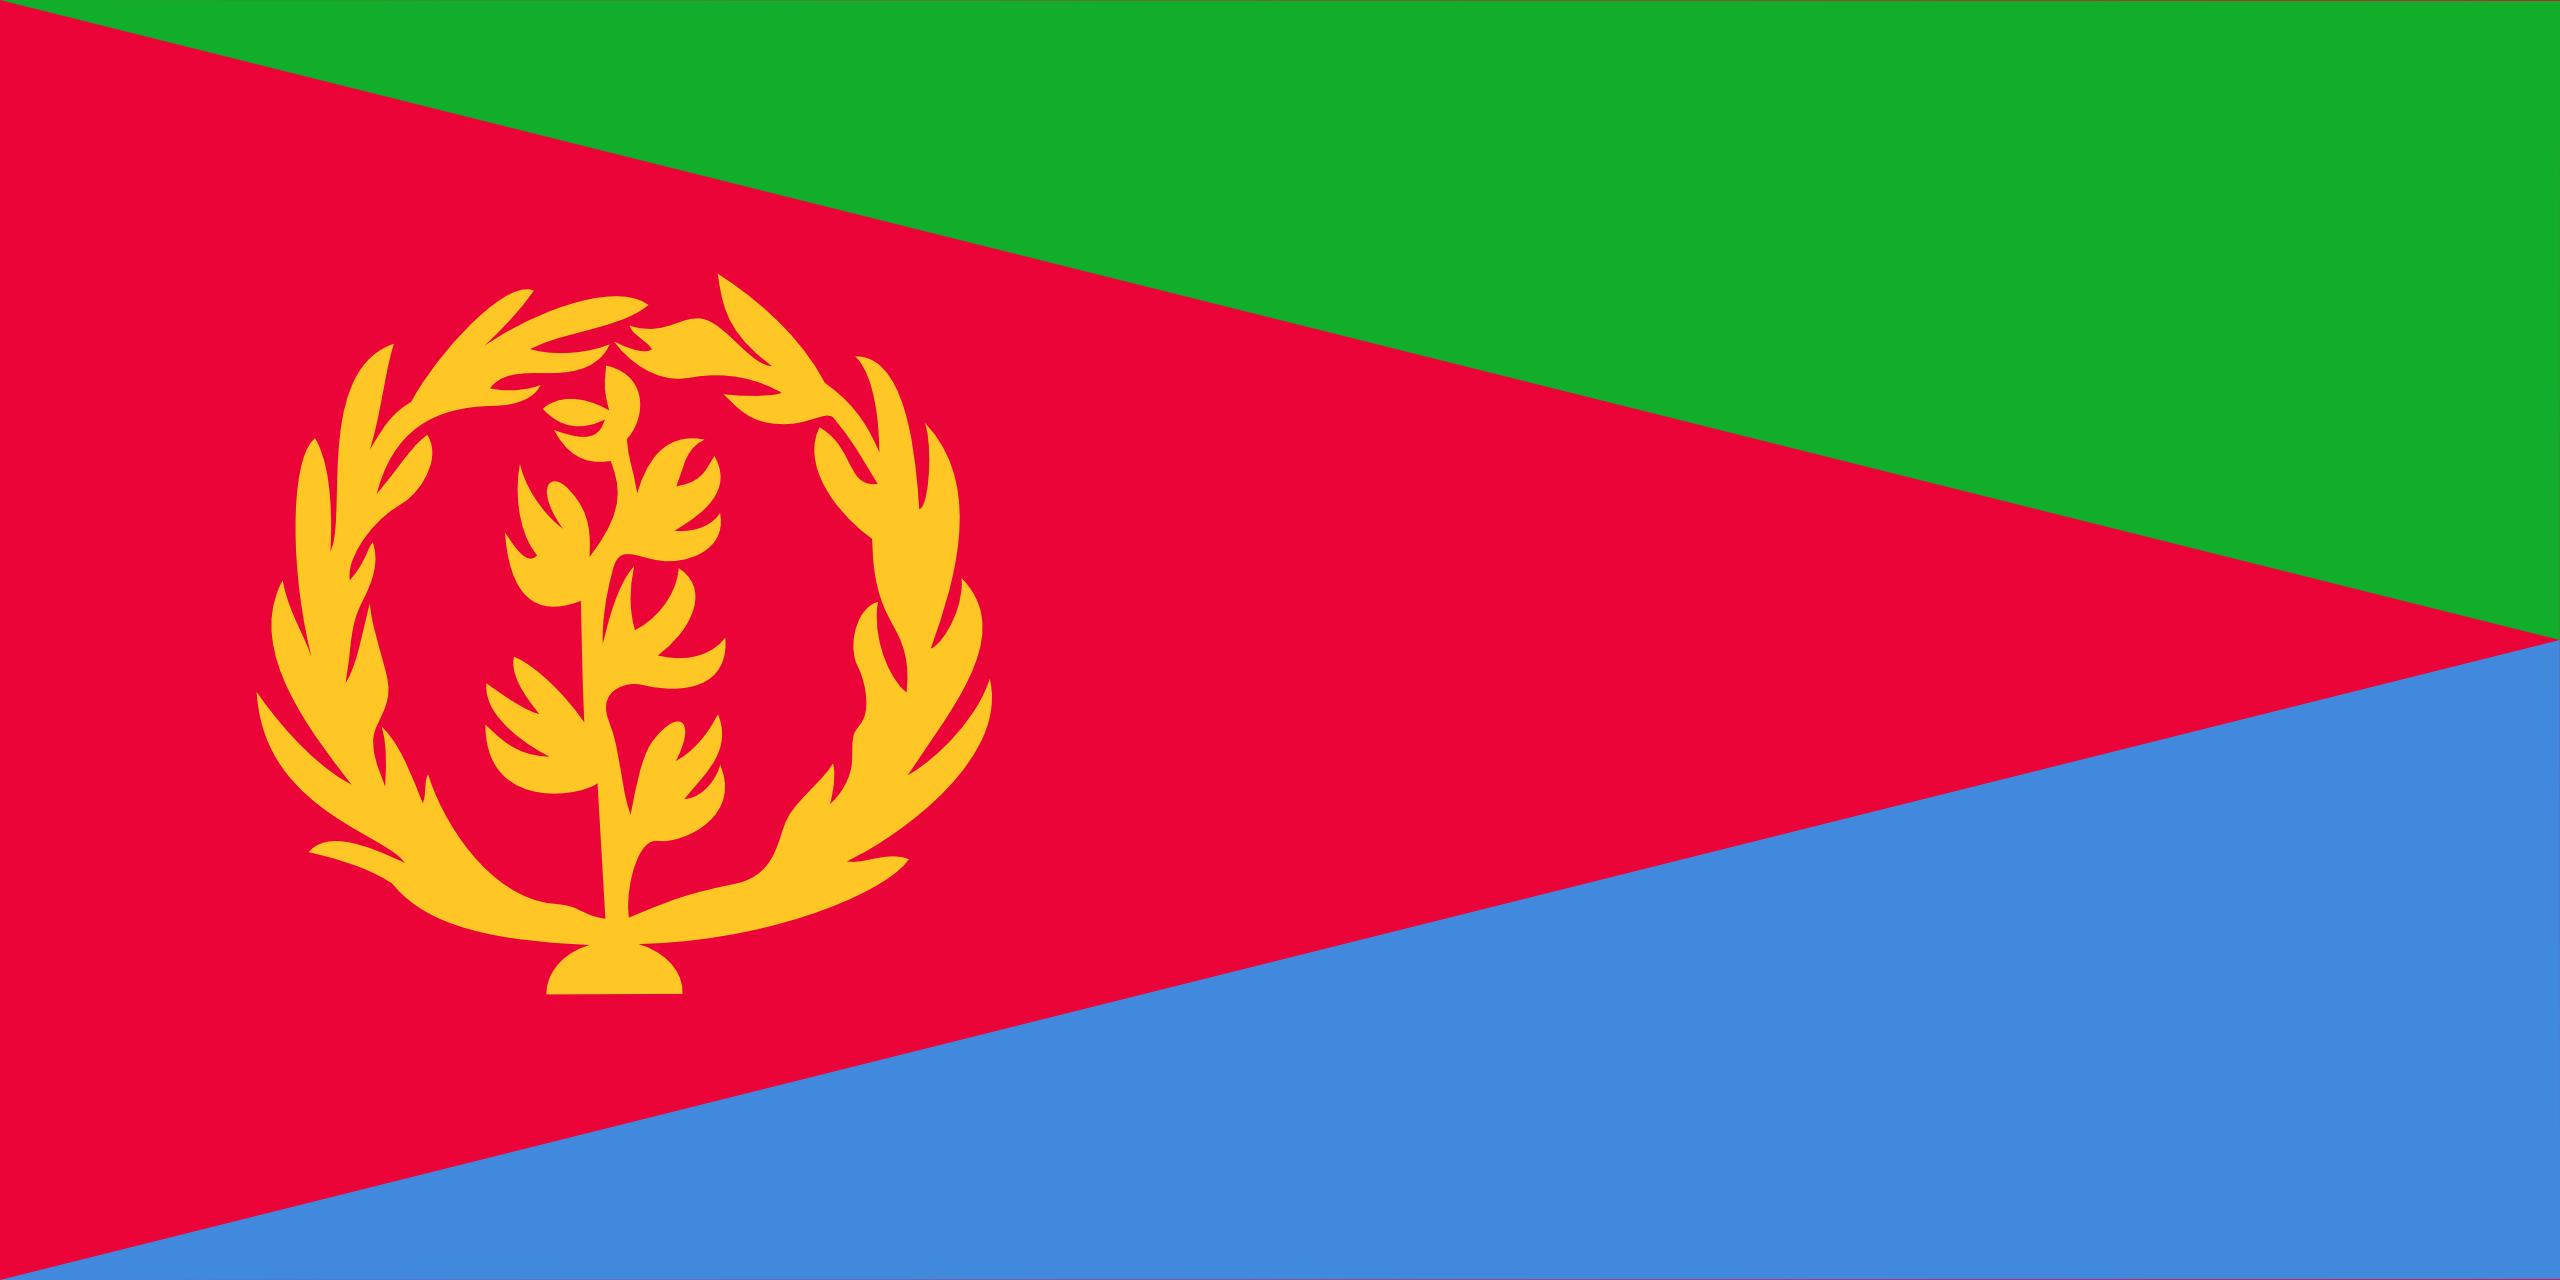 eritrea, país, emblema, insignia, प्रतीक - HD वॉलपेपर - प्रोफेसर-falken.com